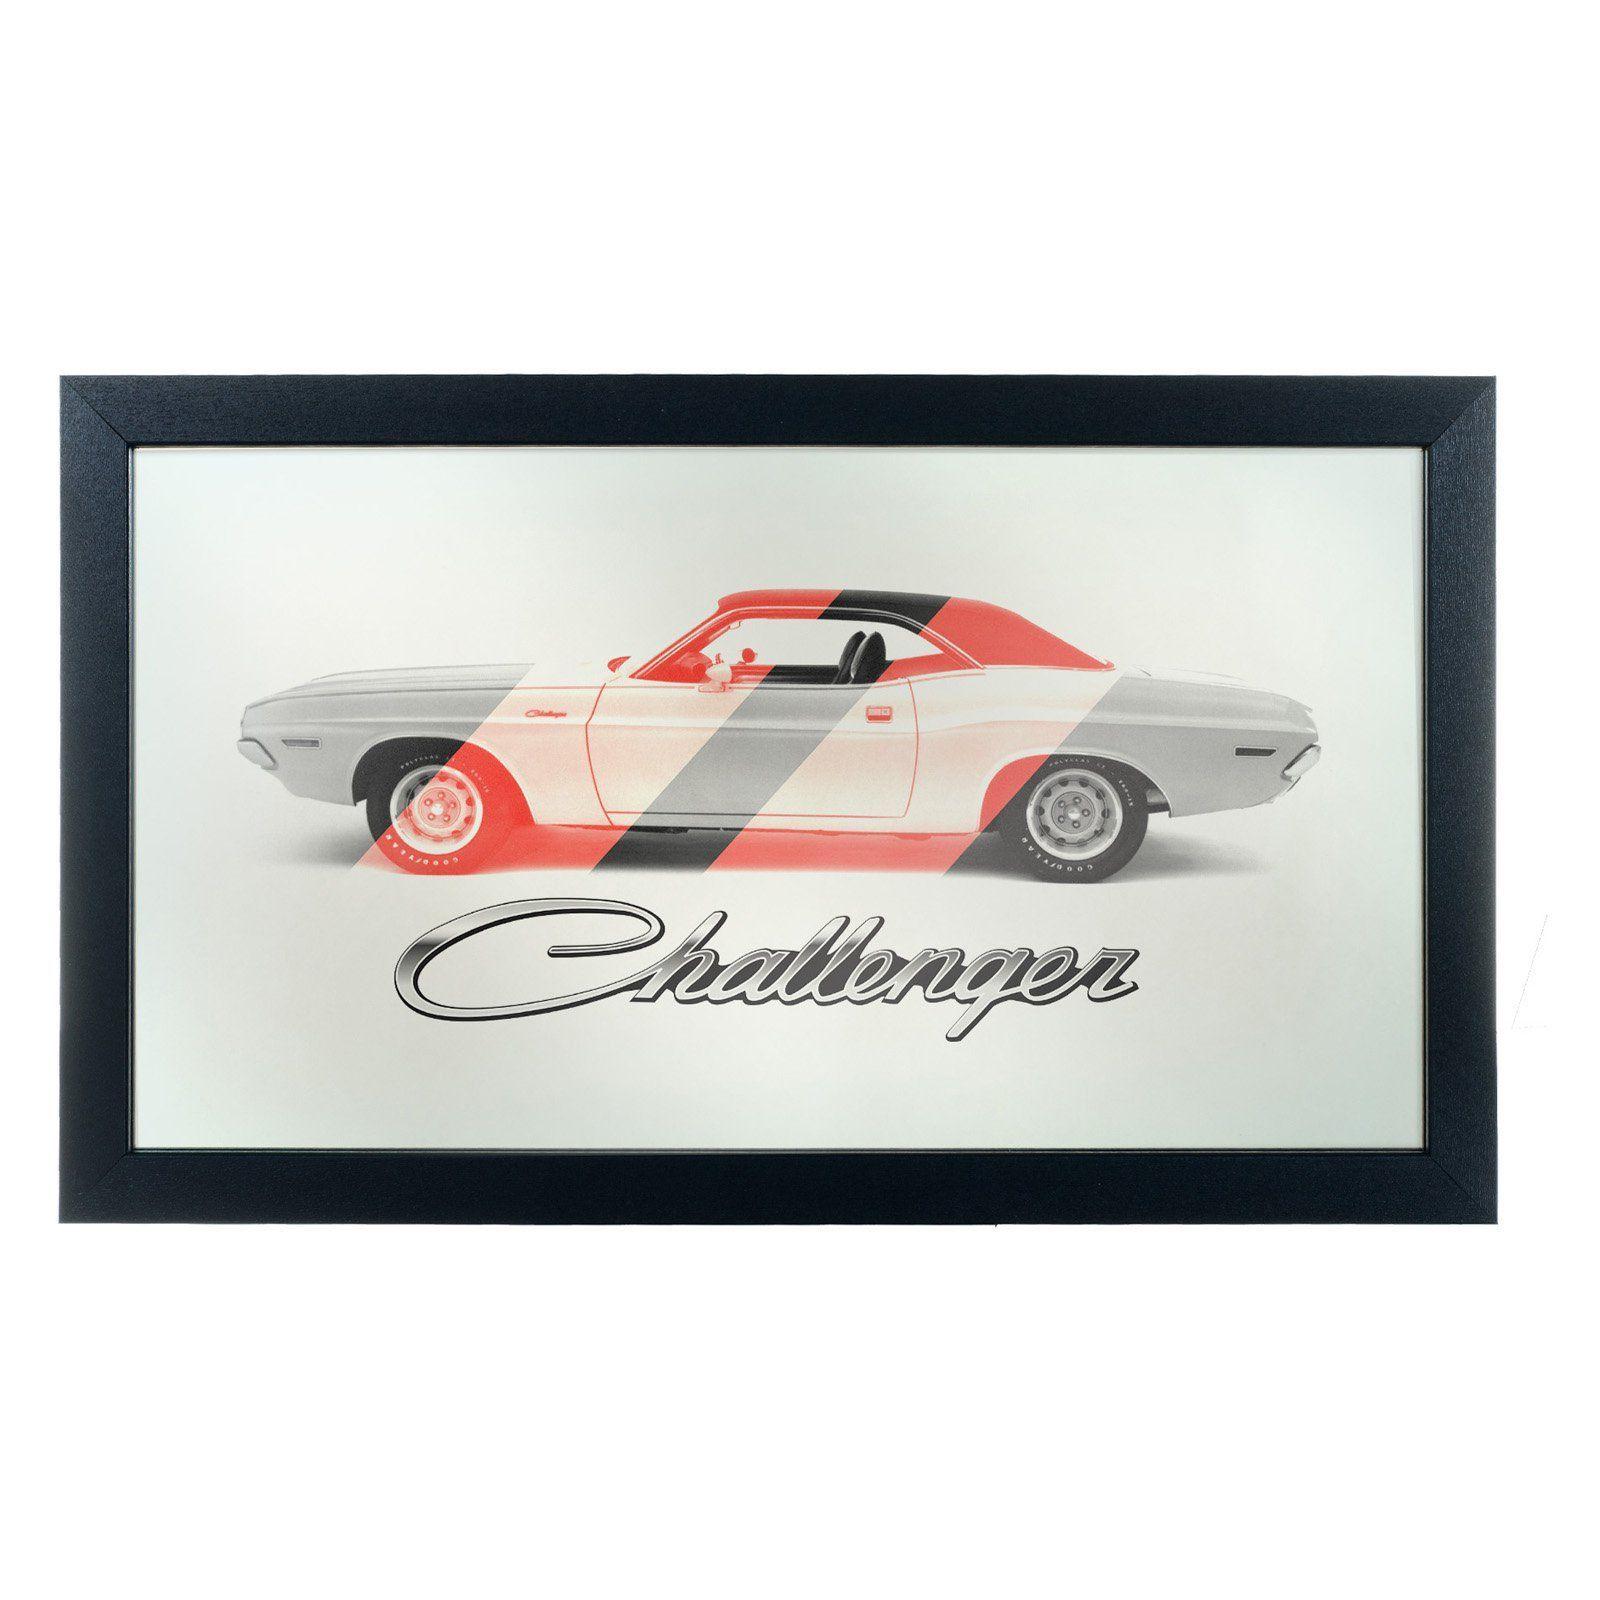 Dodge Challenger Stripes Logo Wall Mirror - DGE1500-STRIPE